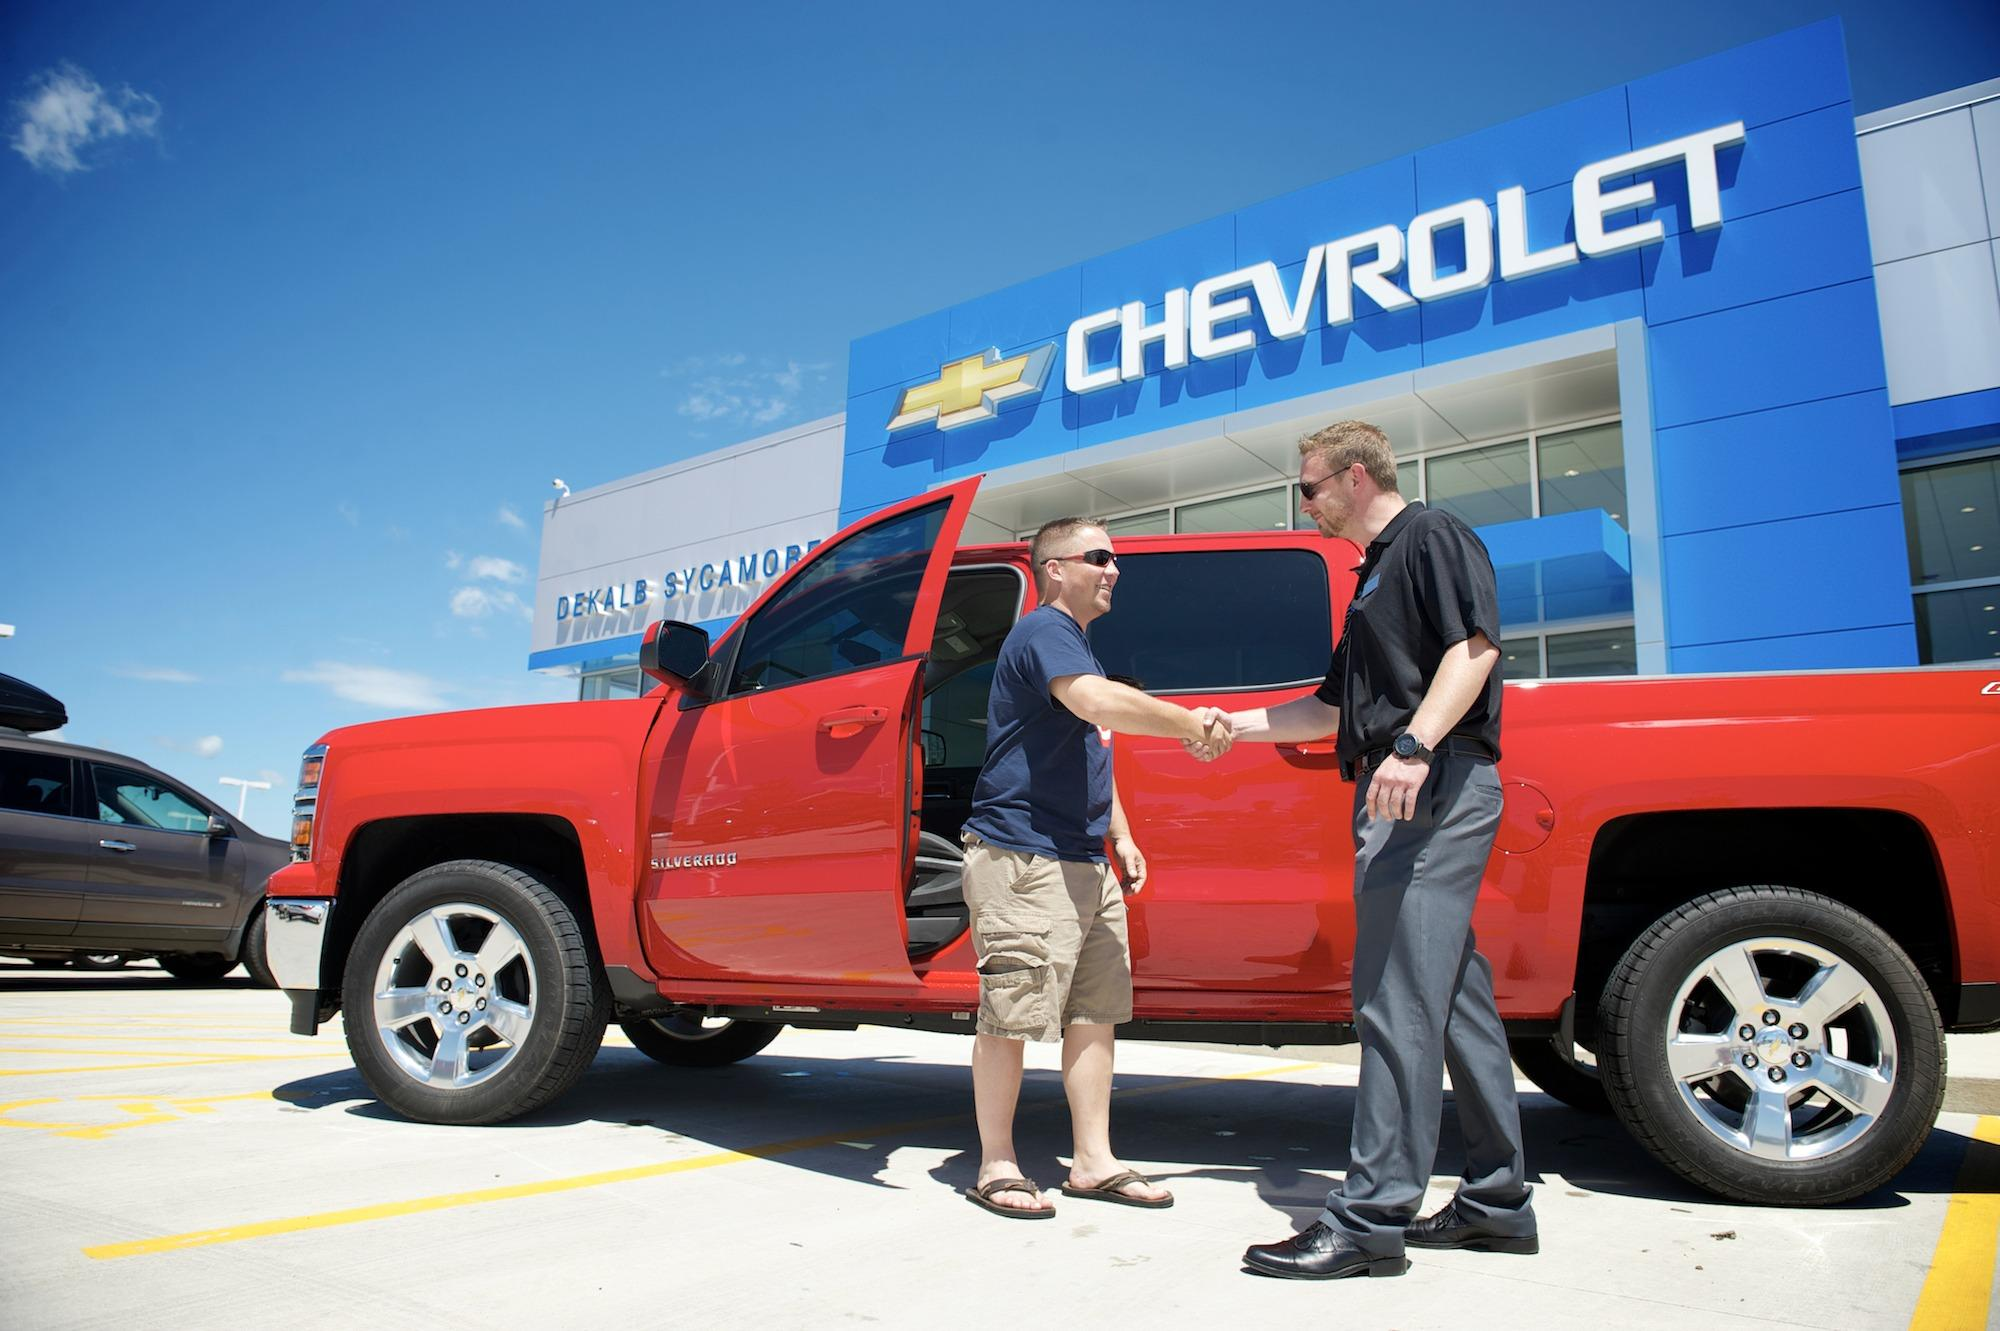 DeKalb Sycamore Chevrolet GMC image 1